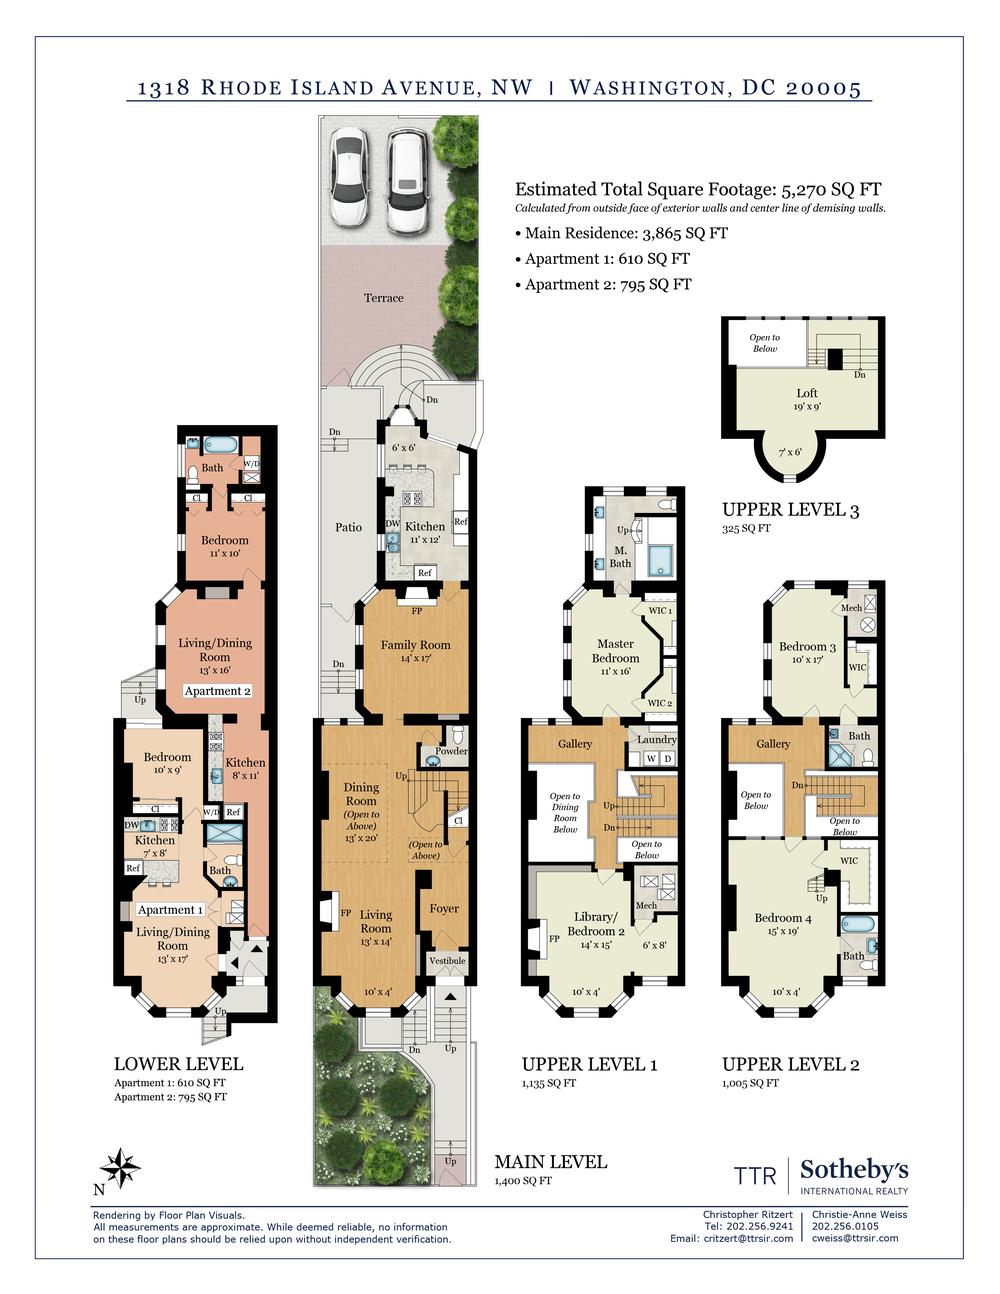 TW-1318RhodeIslandAveNW-FloorPlan-Print.jpg